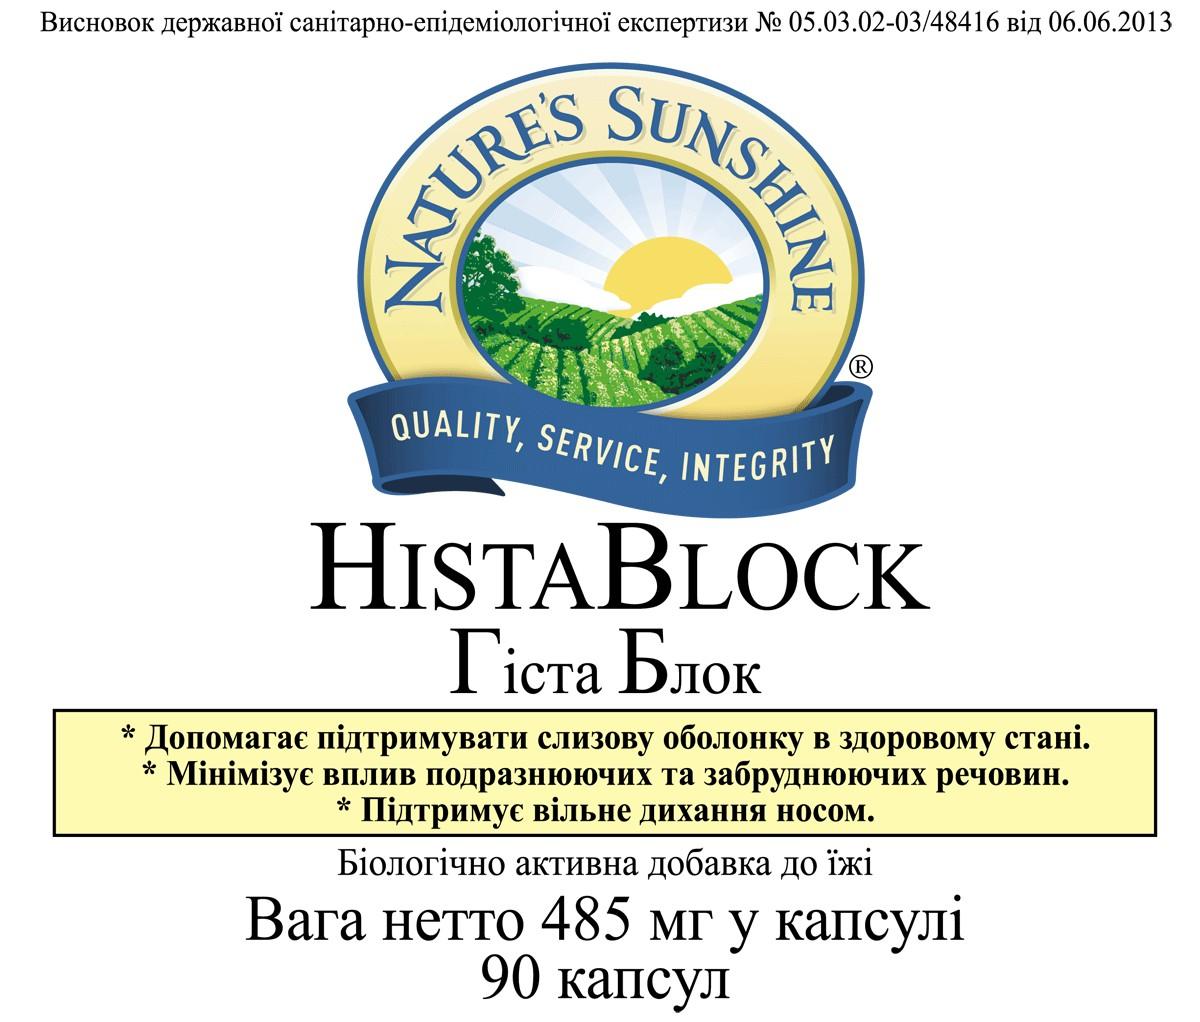 Hista Block [776] 20%